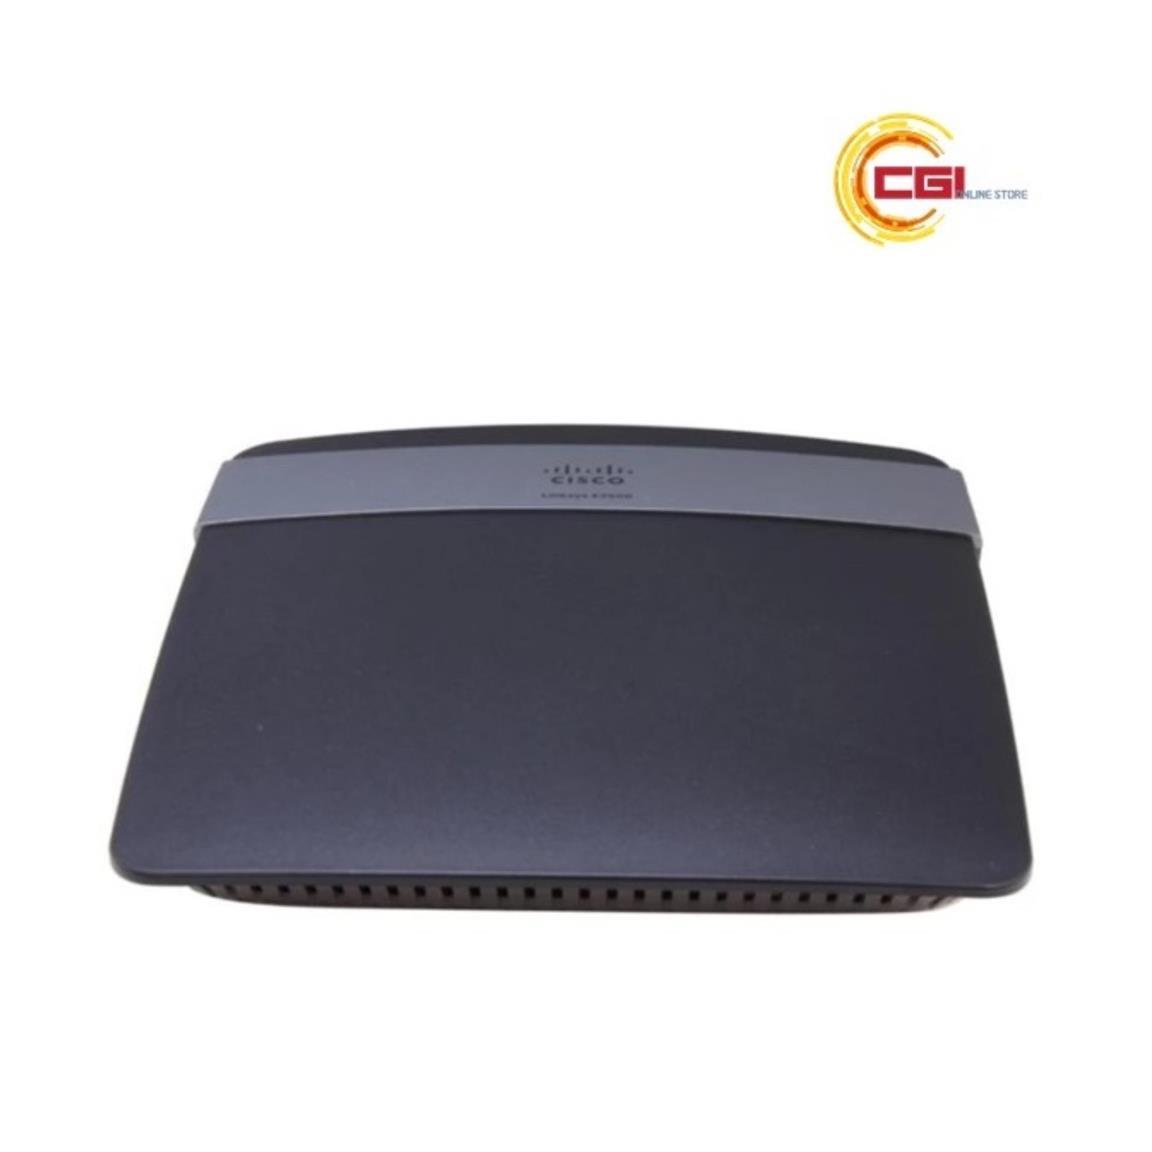 Linksys E2500 N600 Dual-Band Wi-Fi Router (E2500-AP)